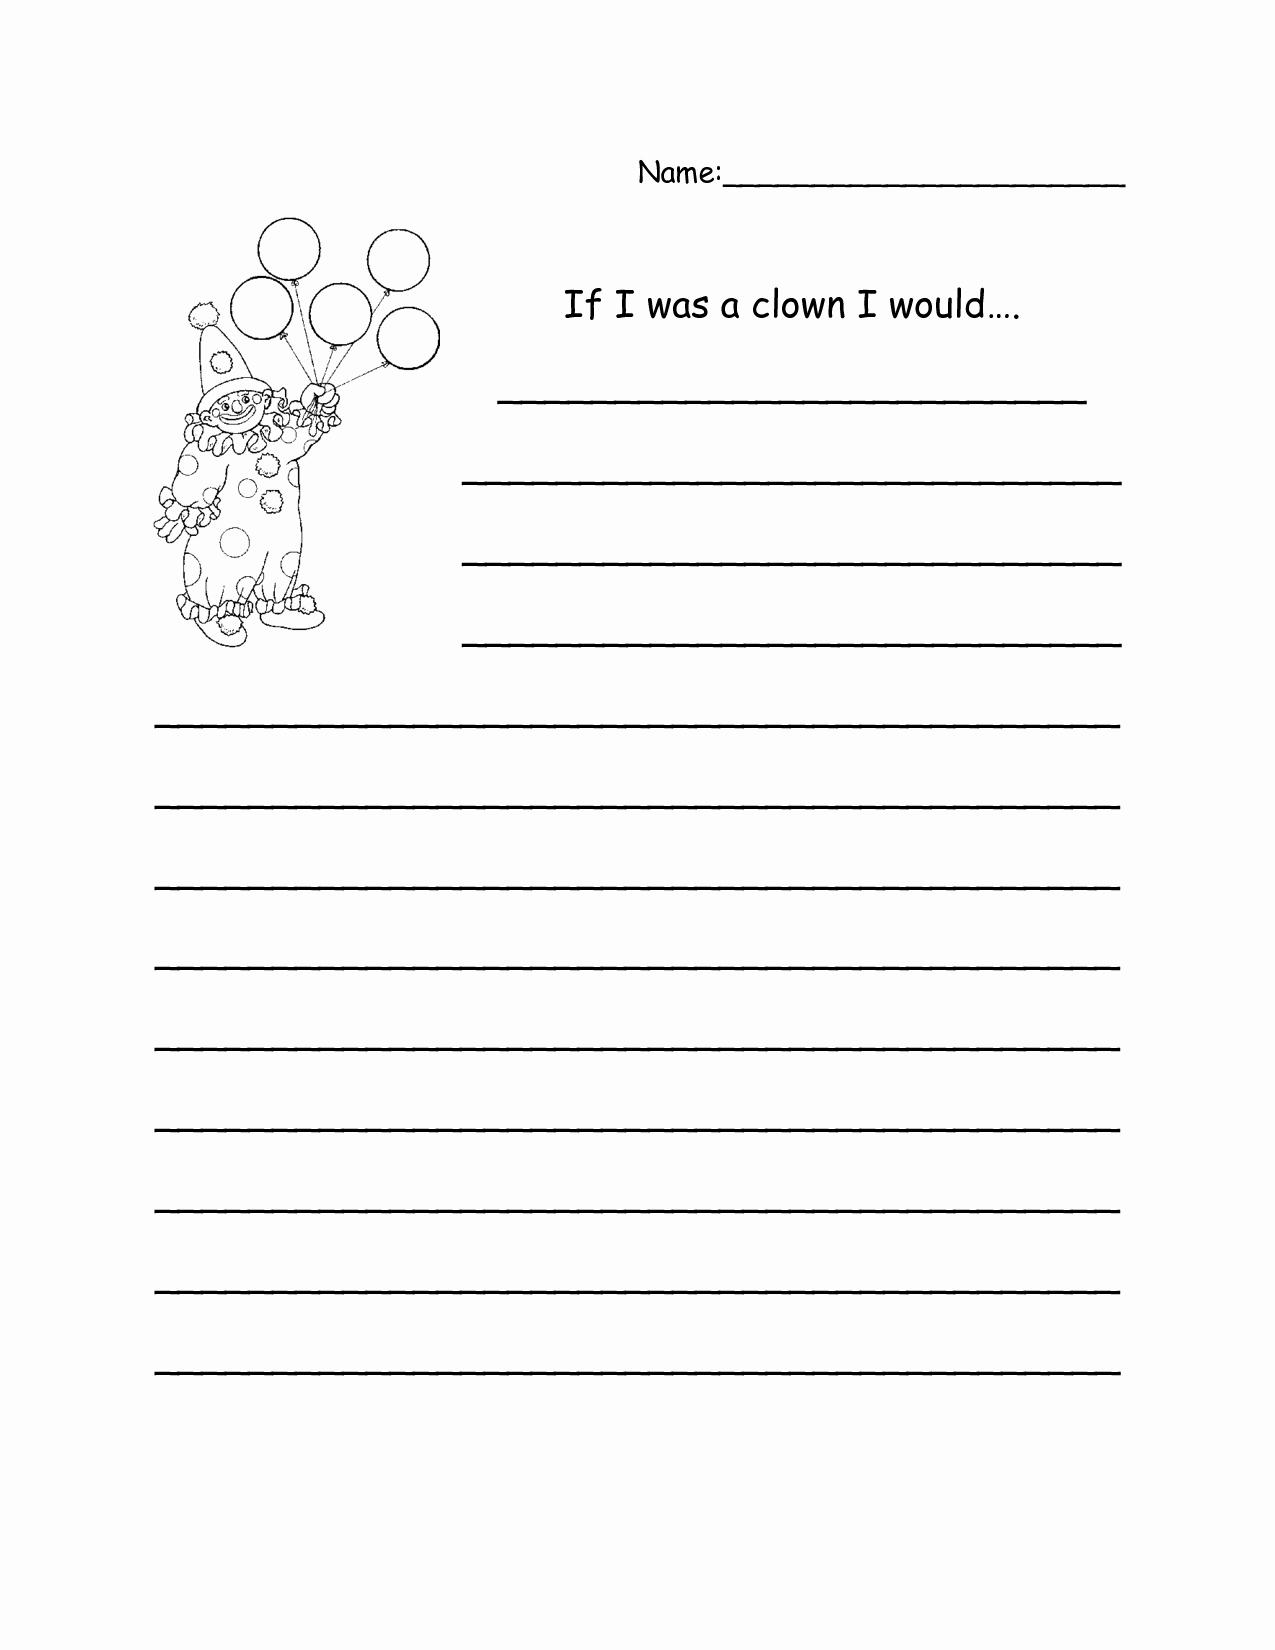 3rd Grade Essay Writing Worksheet Best Of 3rd Grade Writing Worksheets Best Coloring Pages for Kids